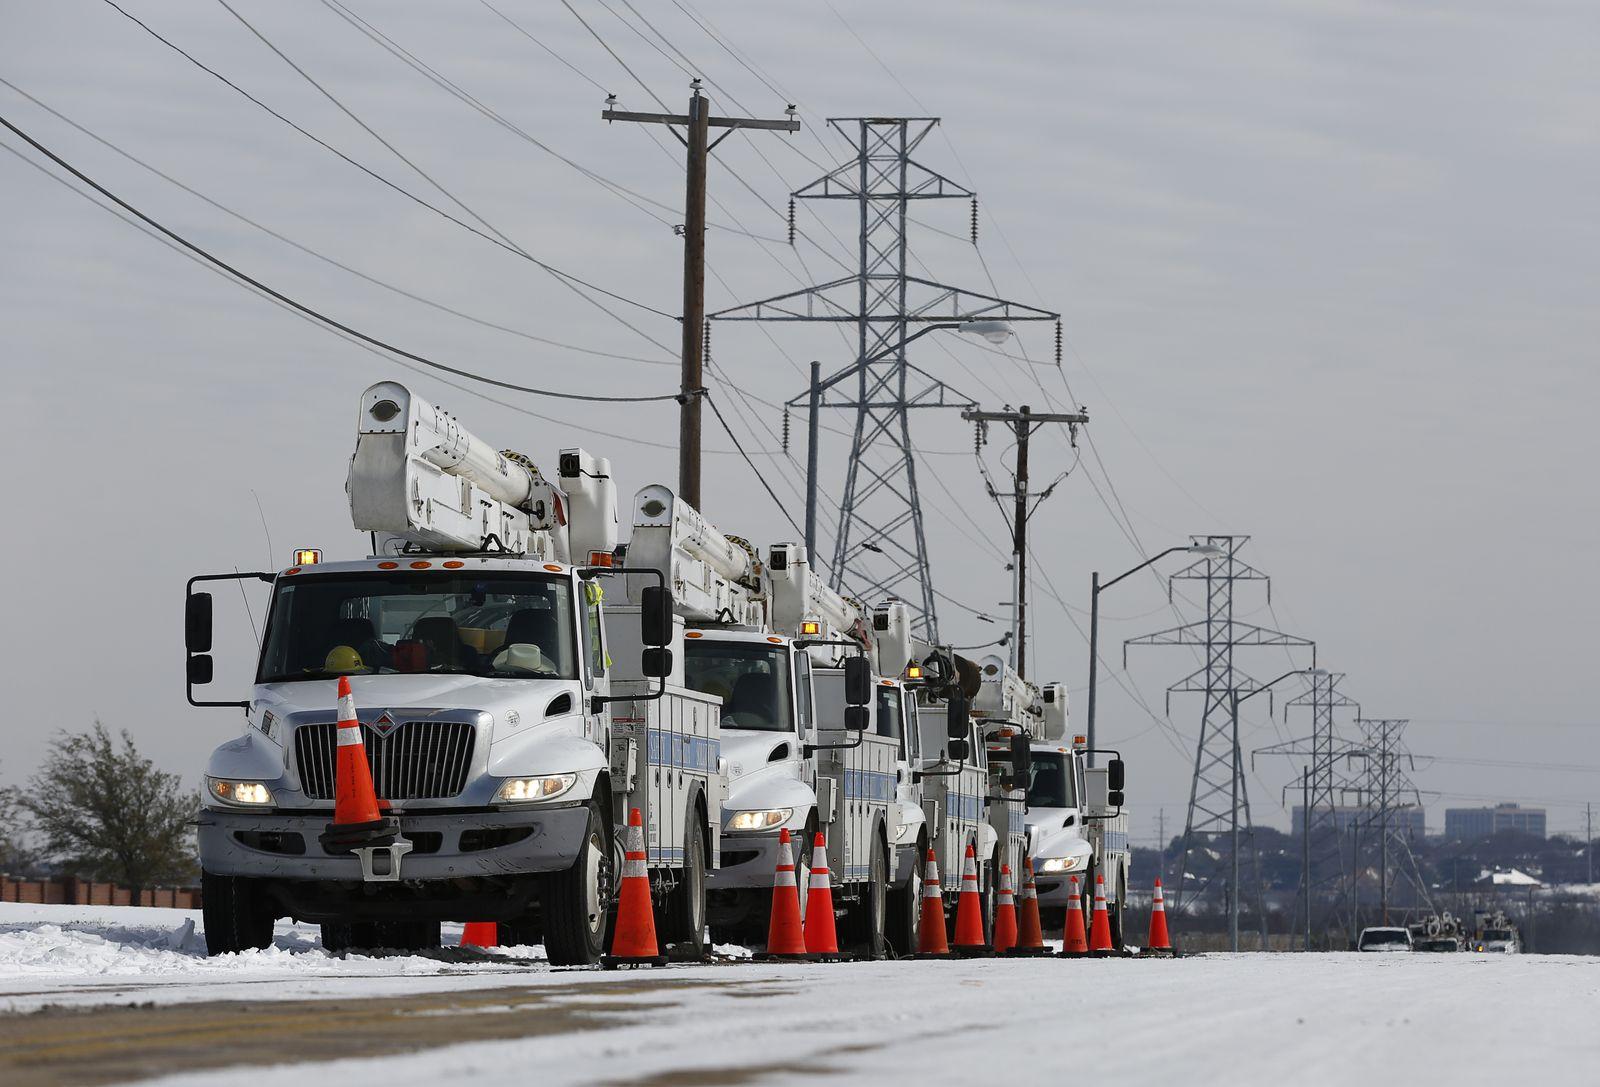 Texas Deep Freeze, Fort Worth, USA - 16 Feb 2021